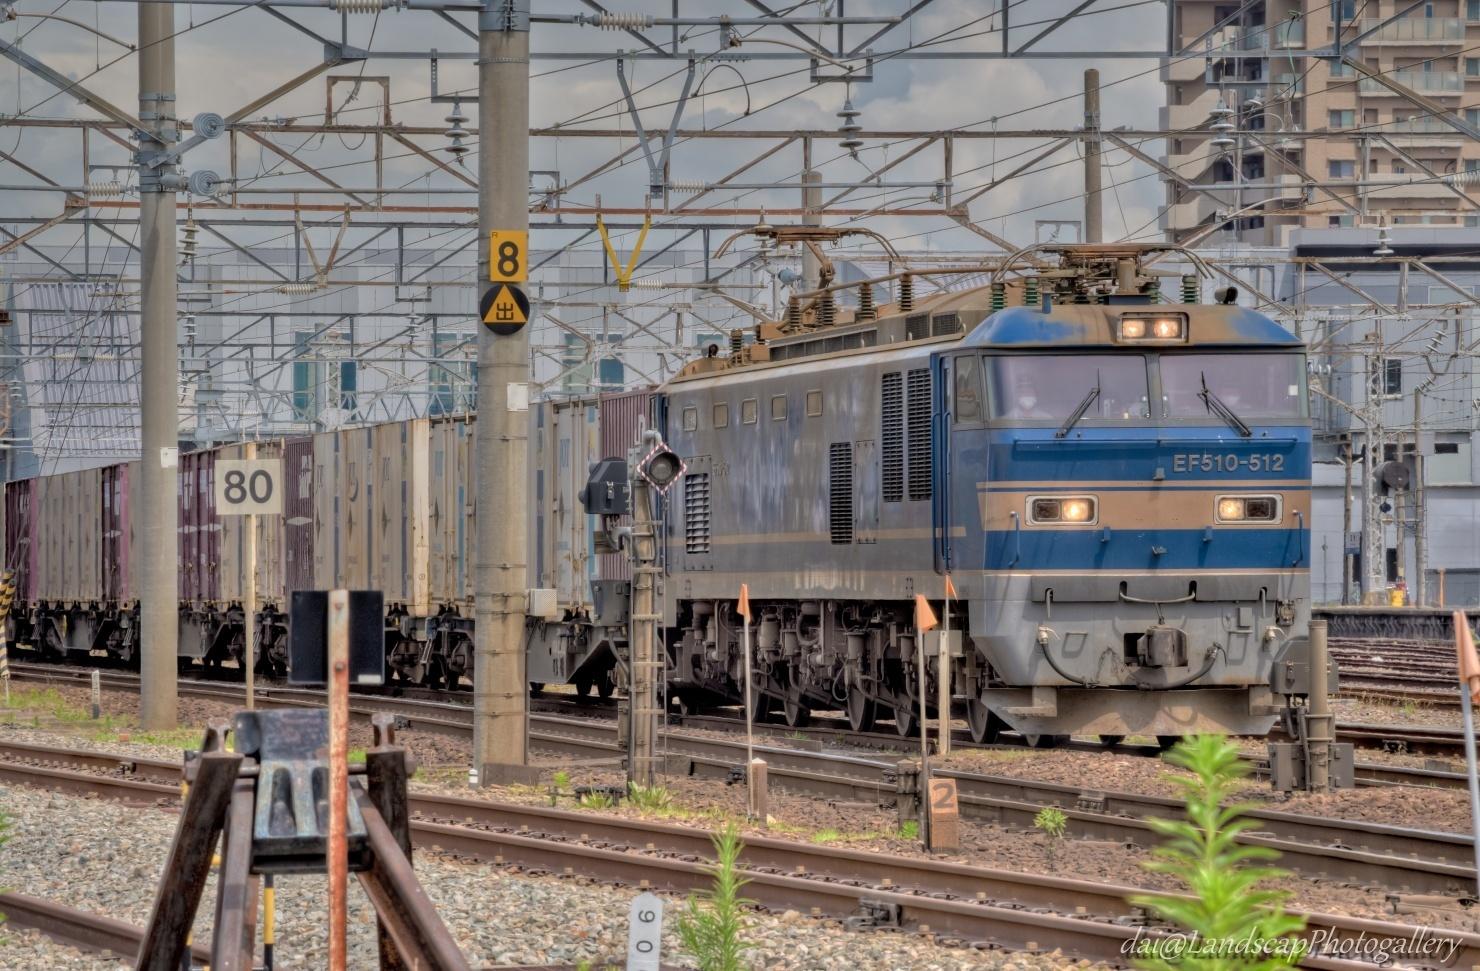 EF510-512 日本海縦貫線コンテナ列車【HDRi】